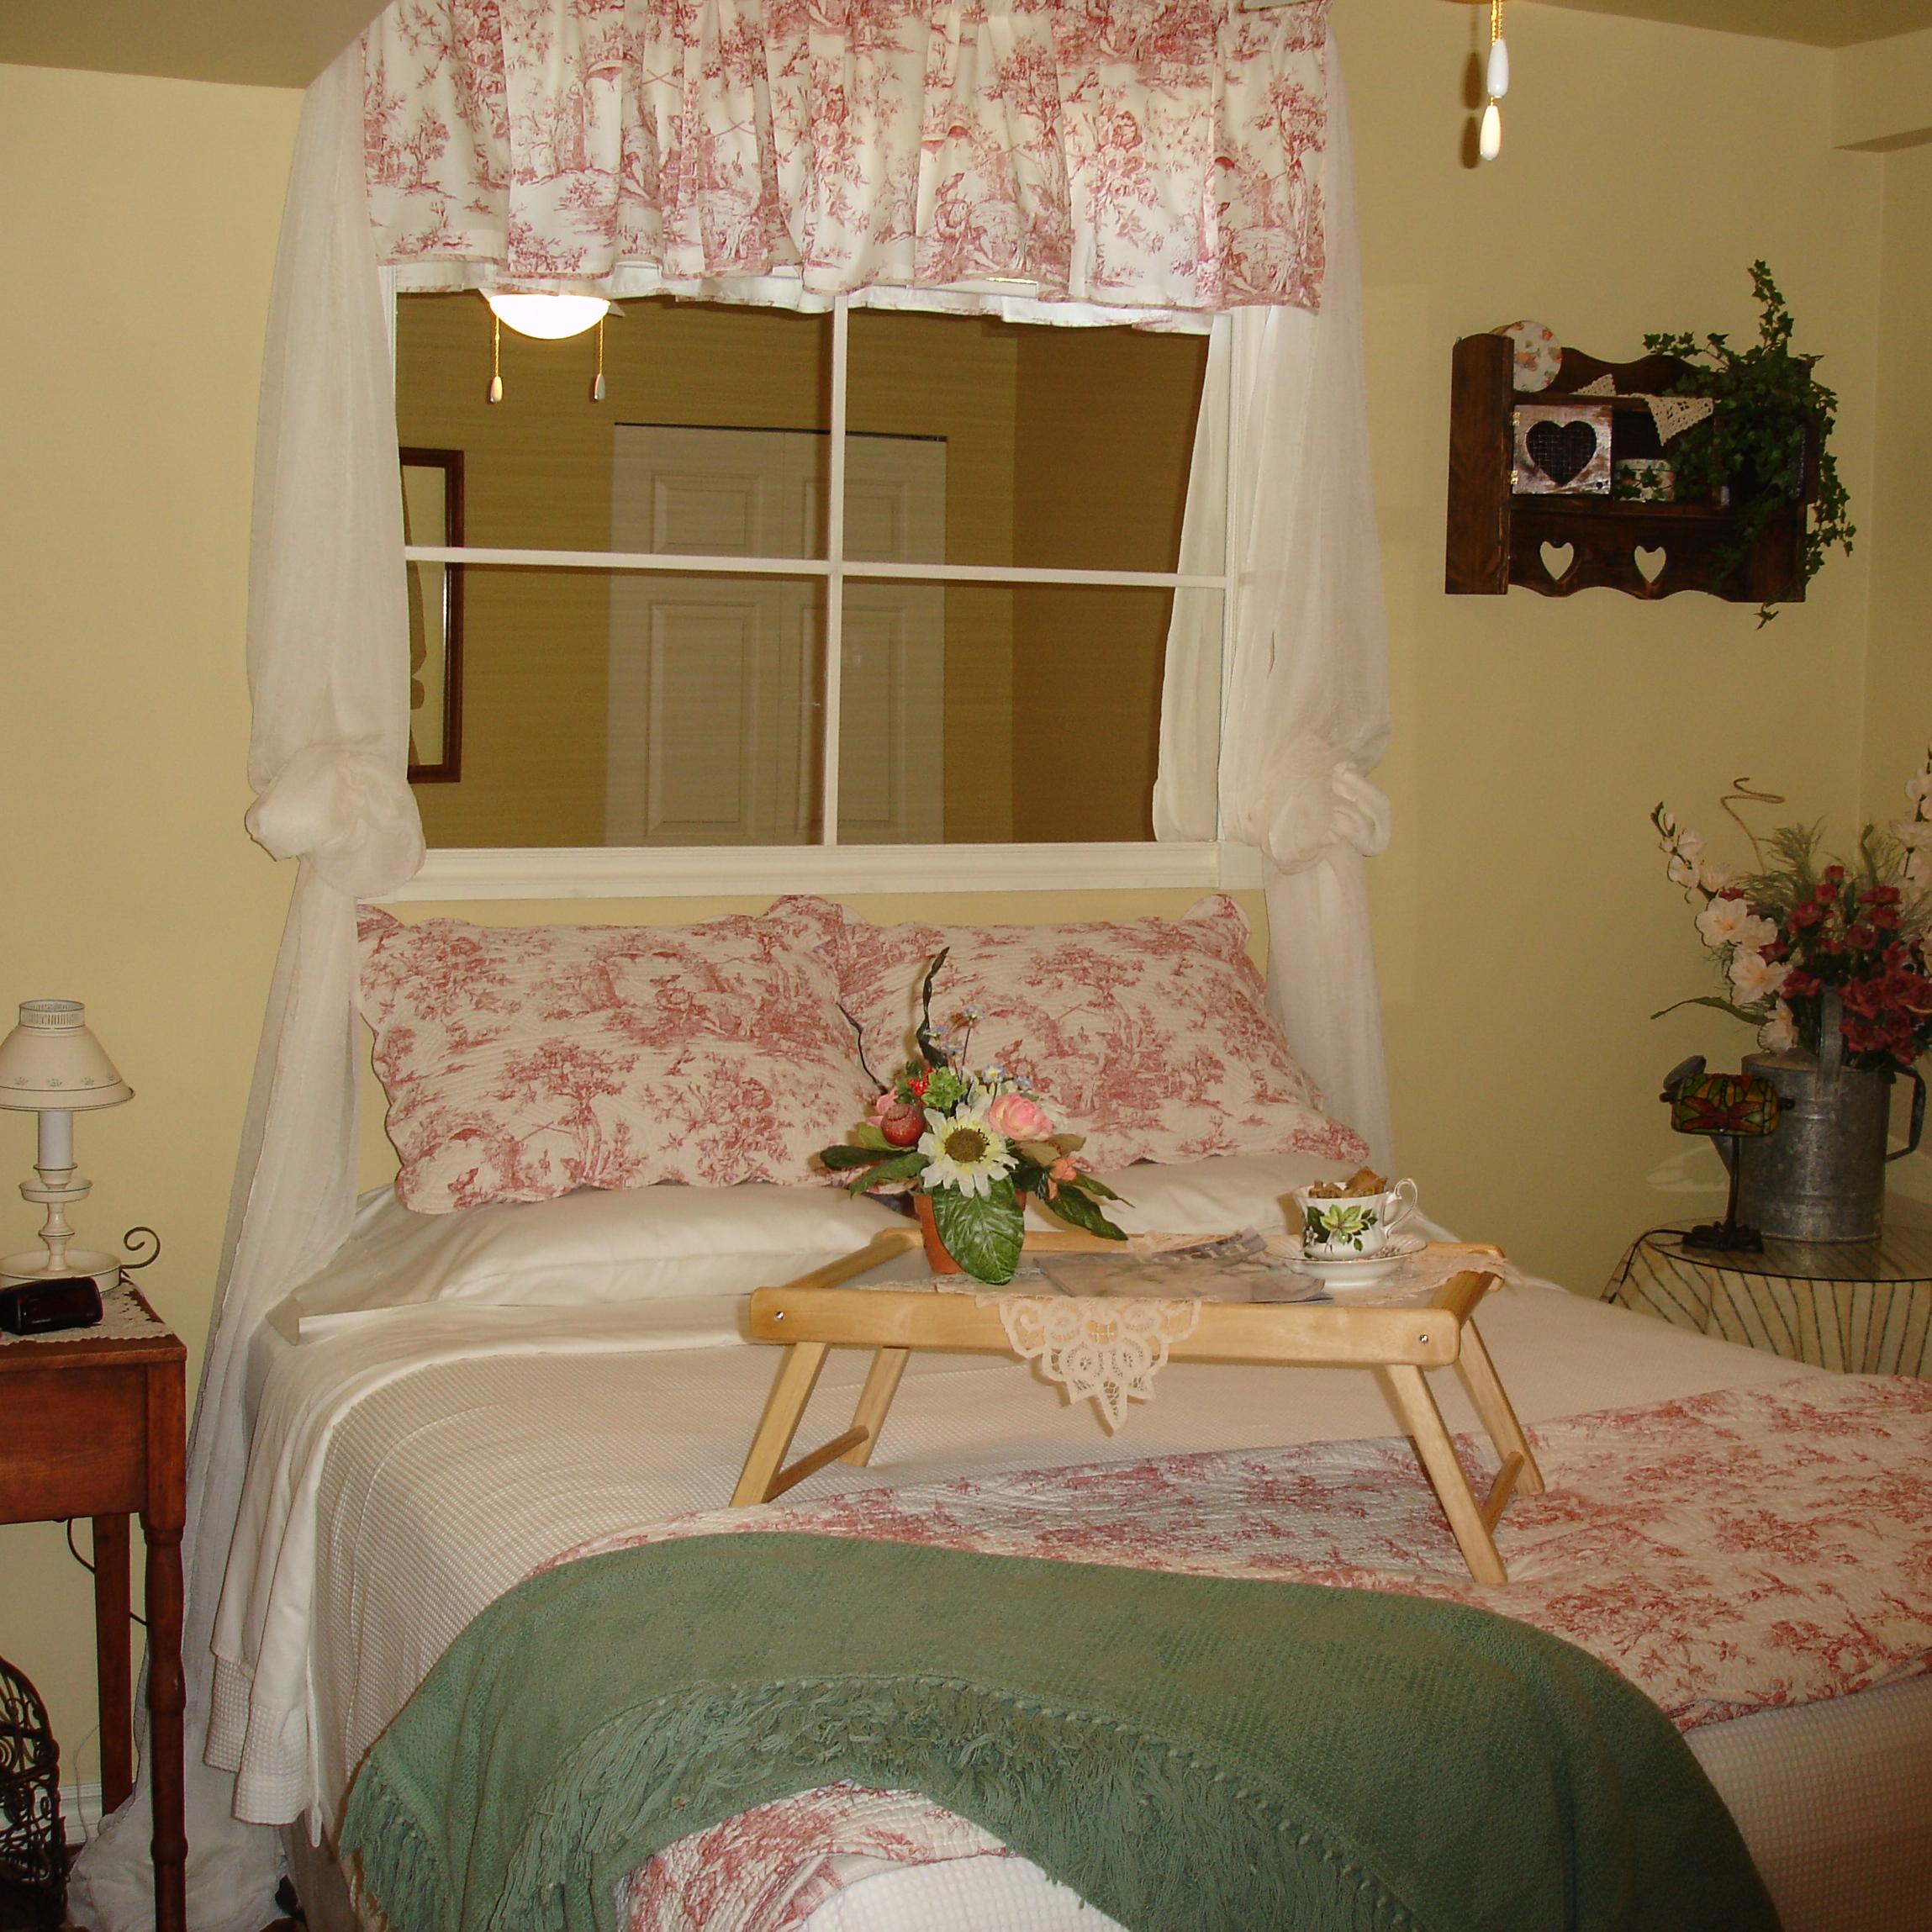 Sylvan Room Osoyoos Bed and Breakfast